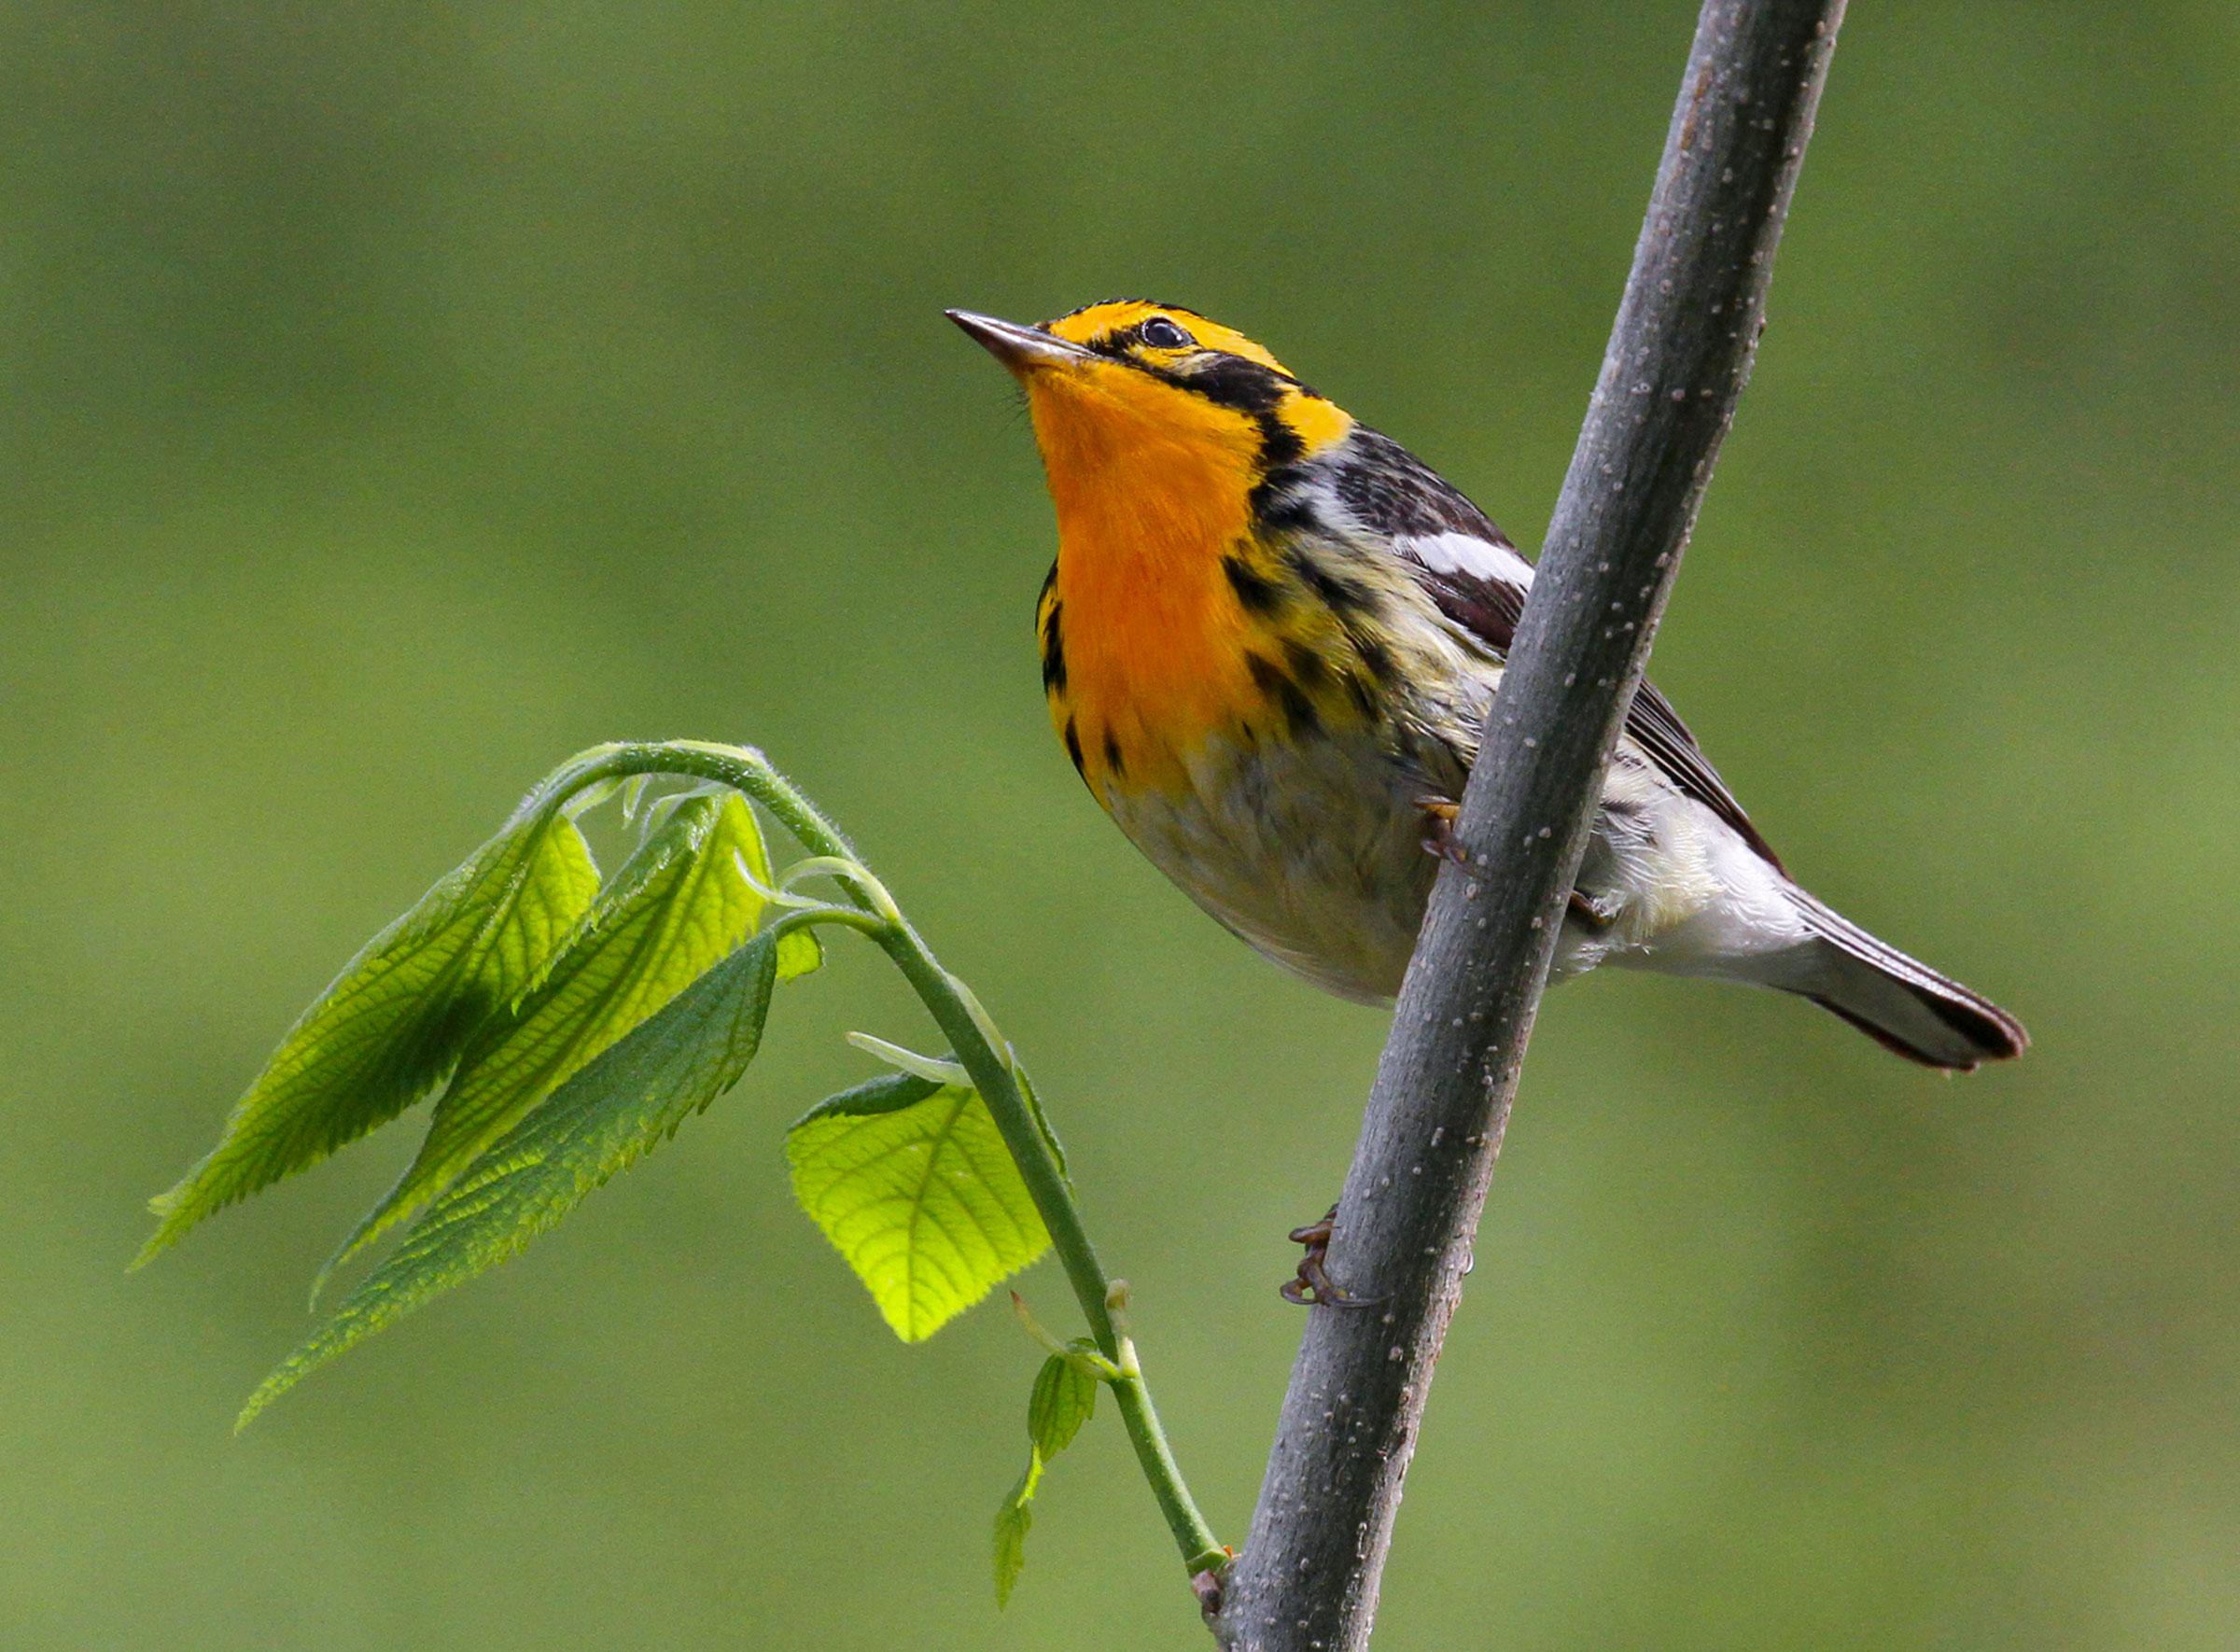 Blackburnian Warbler. Kenn Kaufman